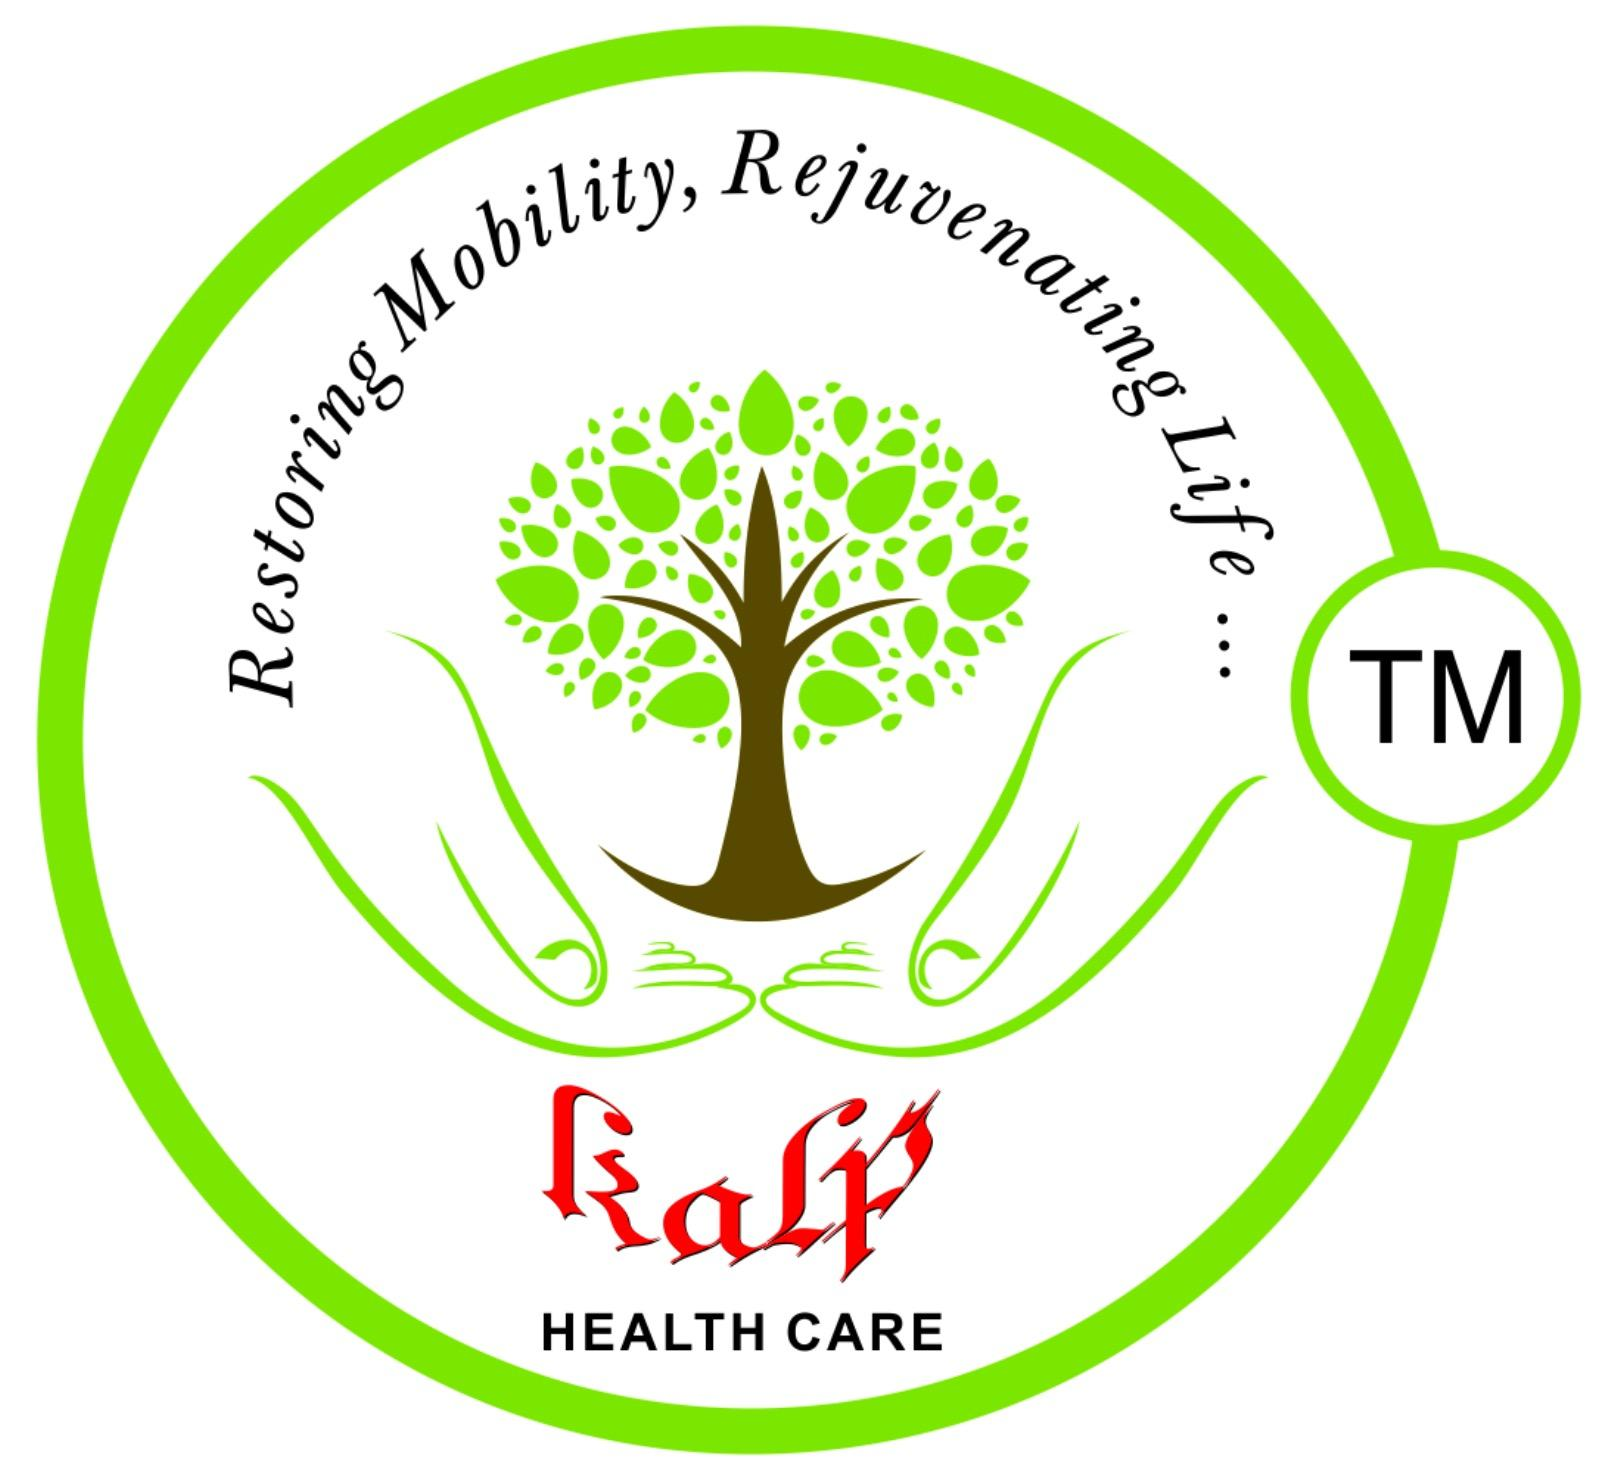 Kalp Health Care